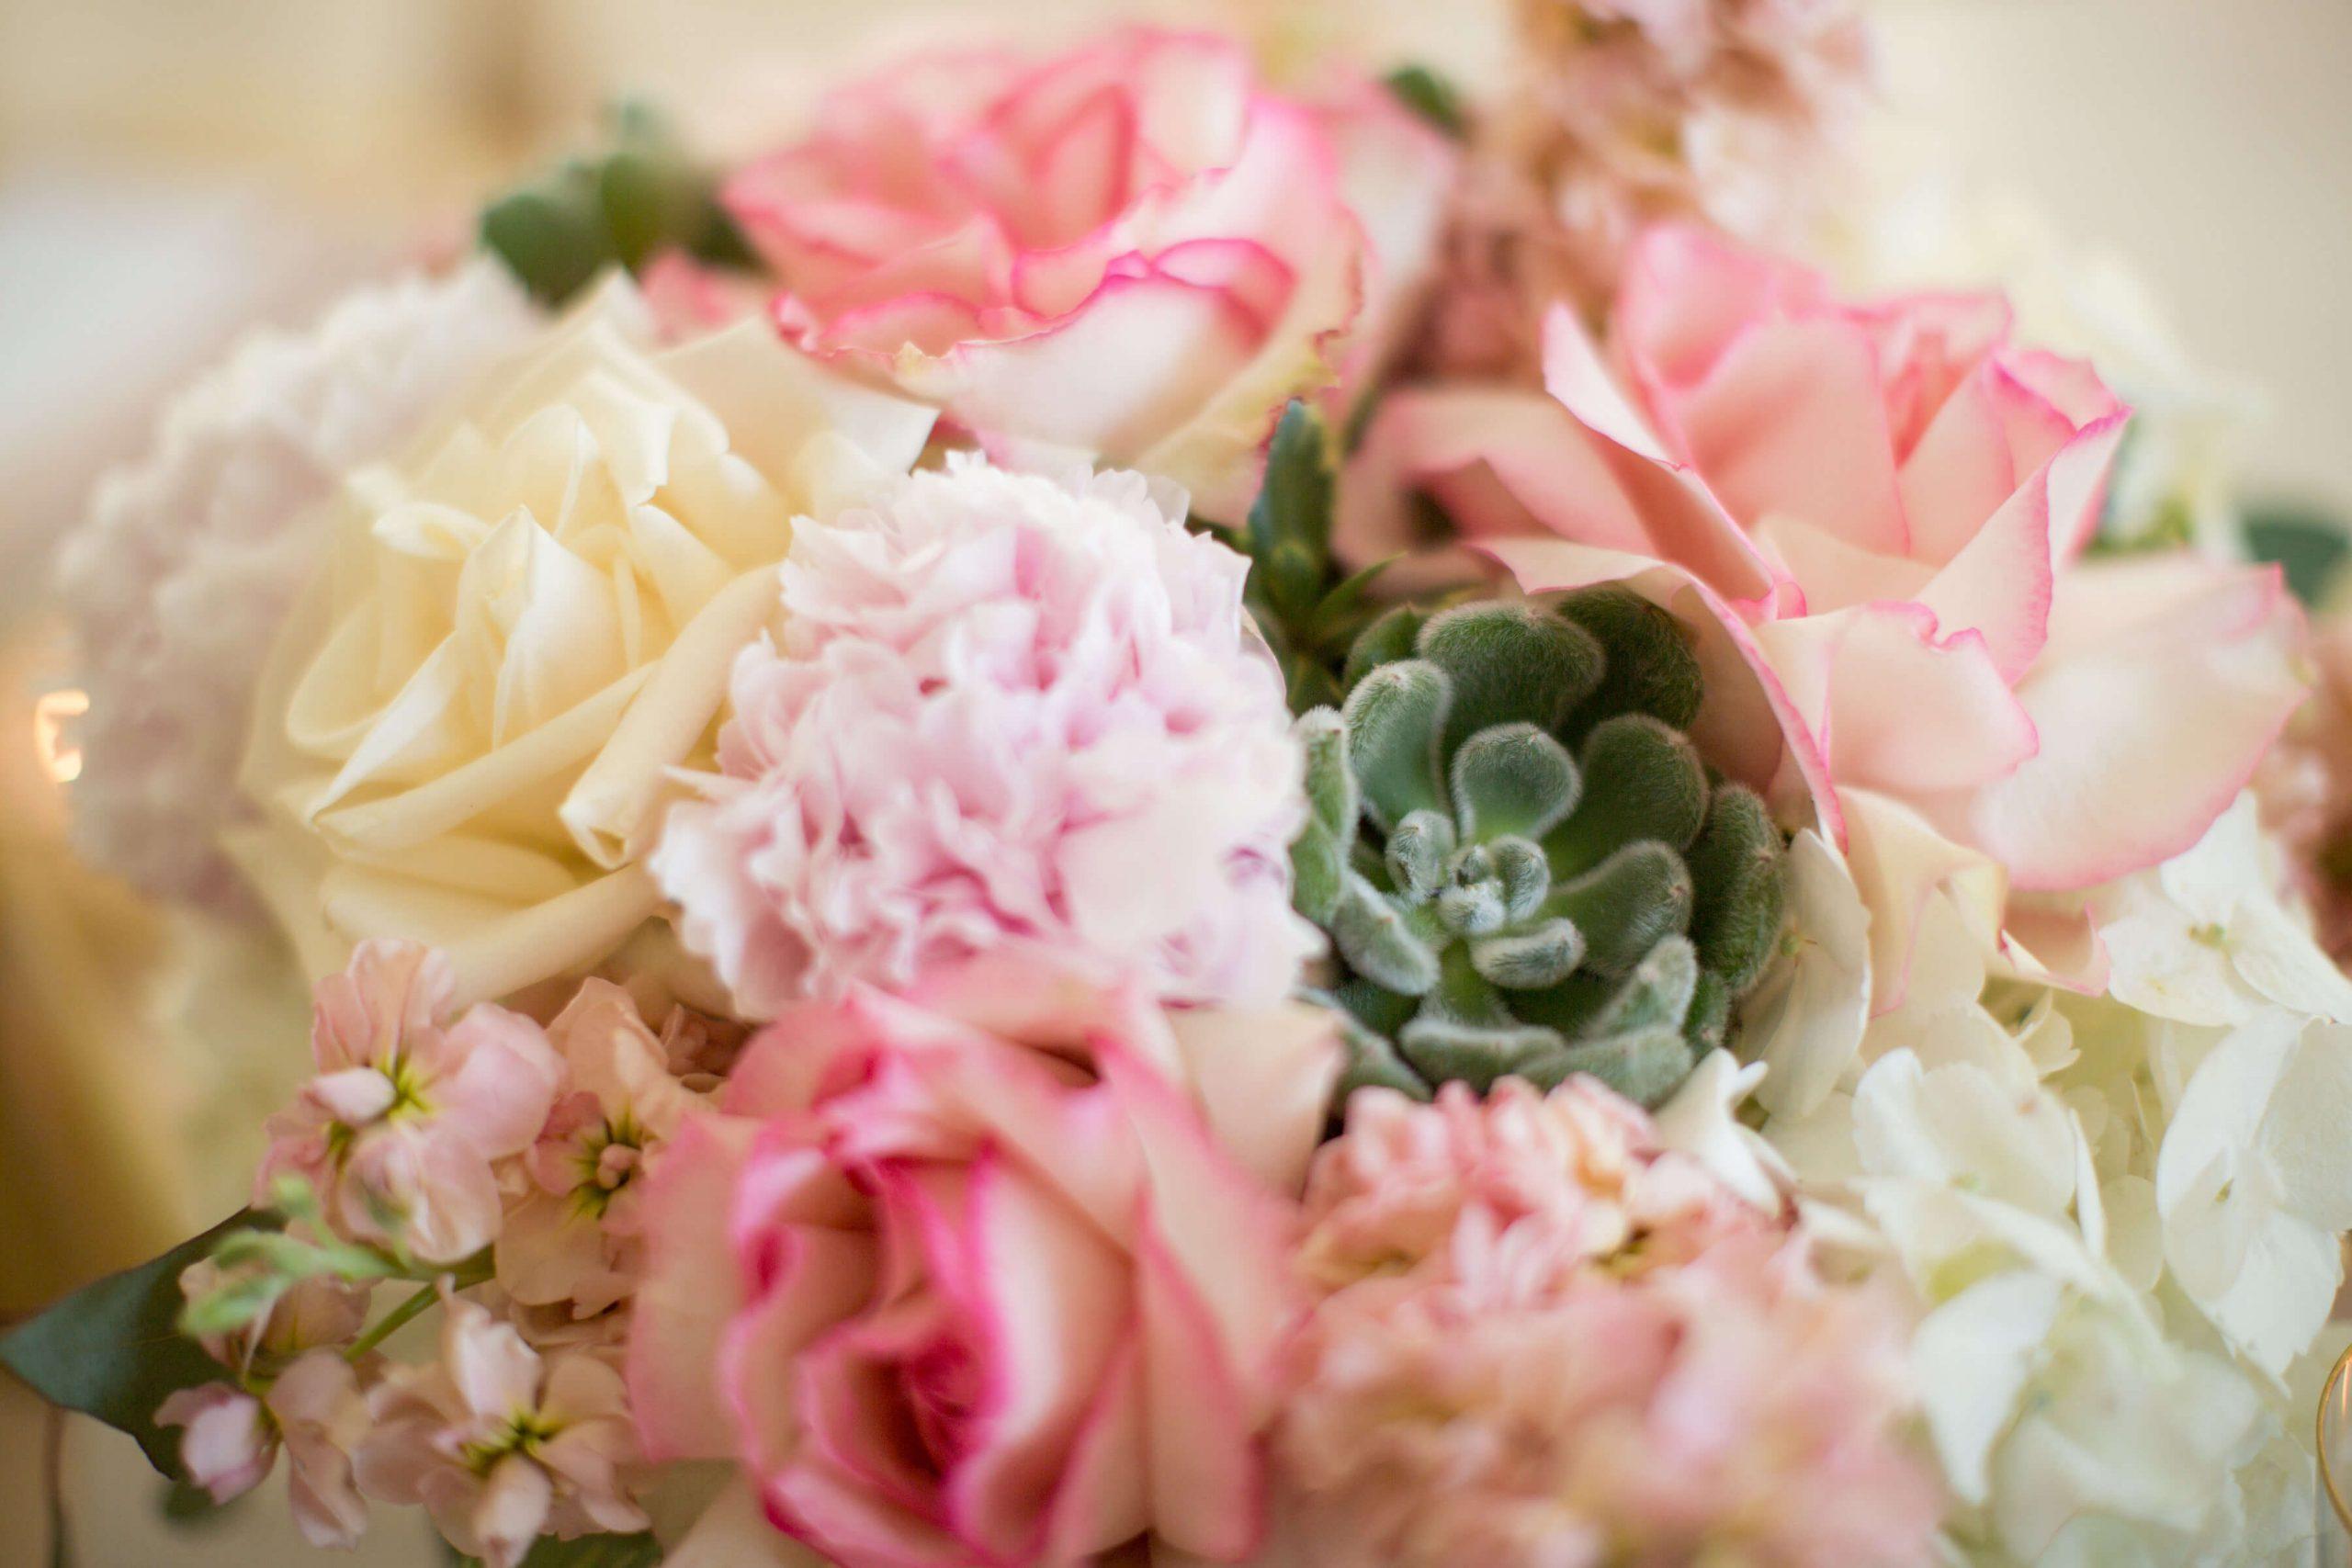 Sweet Spring Soiree at Greenhouse Loft - Alexandra Lee Photography